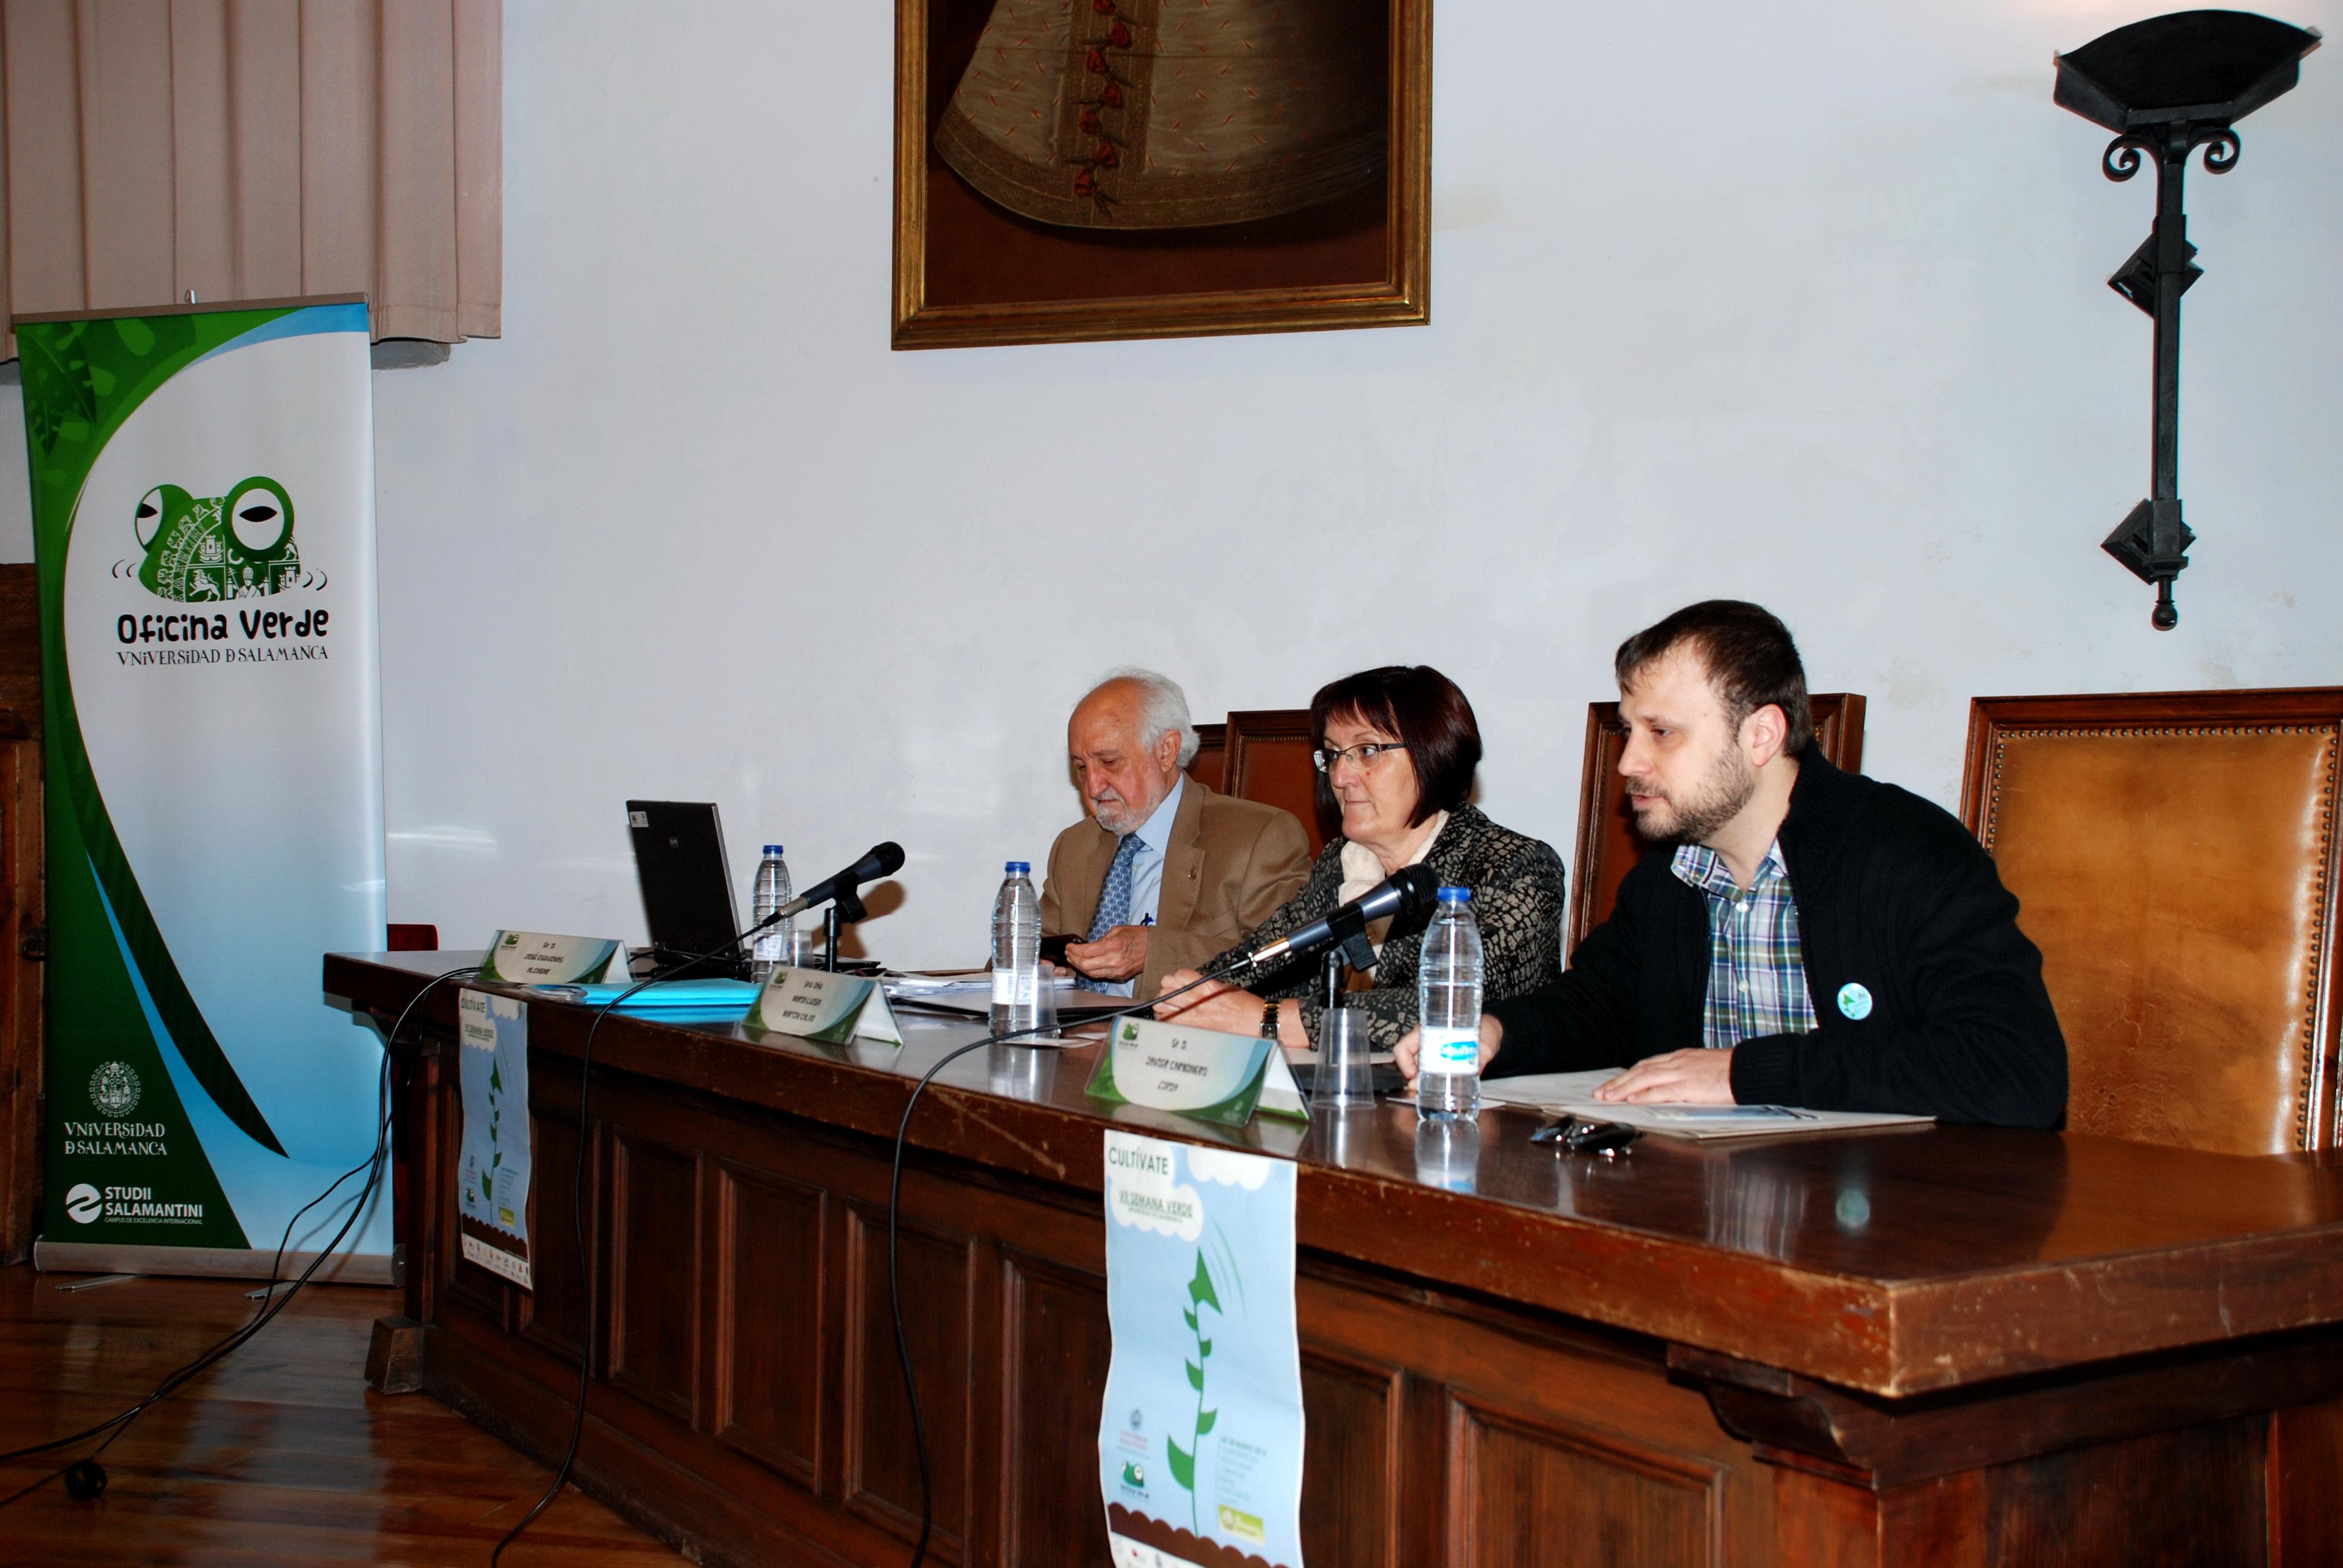 La secretaria general, Mª Luisa Martín Calvo, inaugura la VII Semana Verde de la Universidad de Salamanca